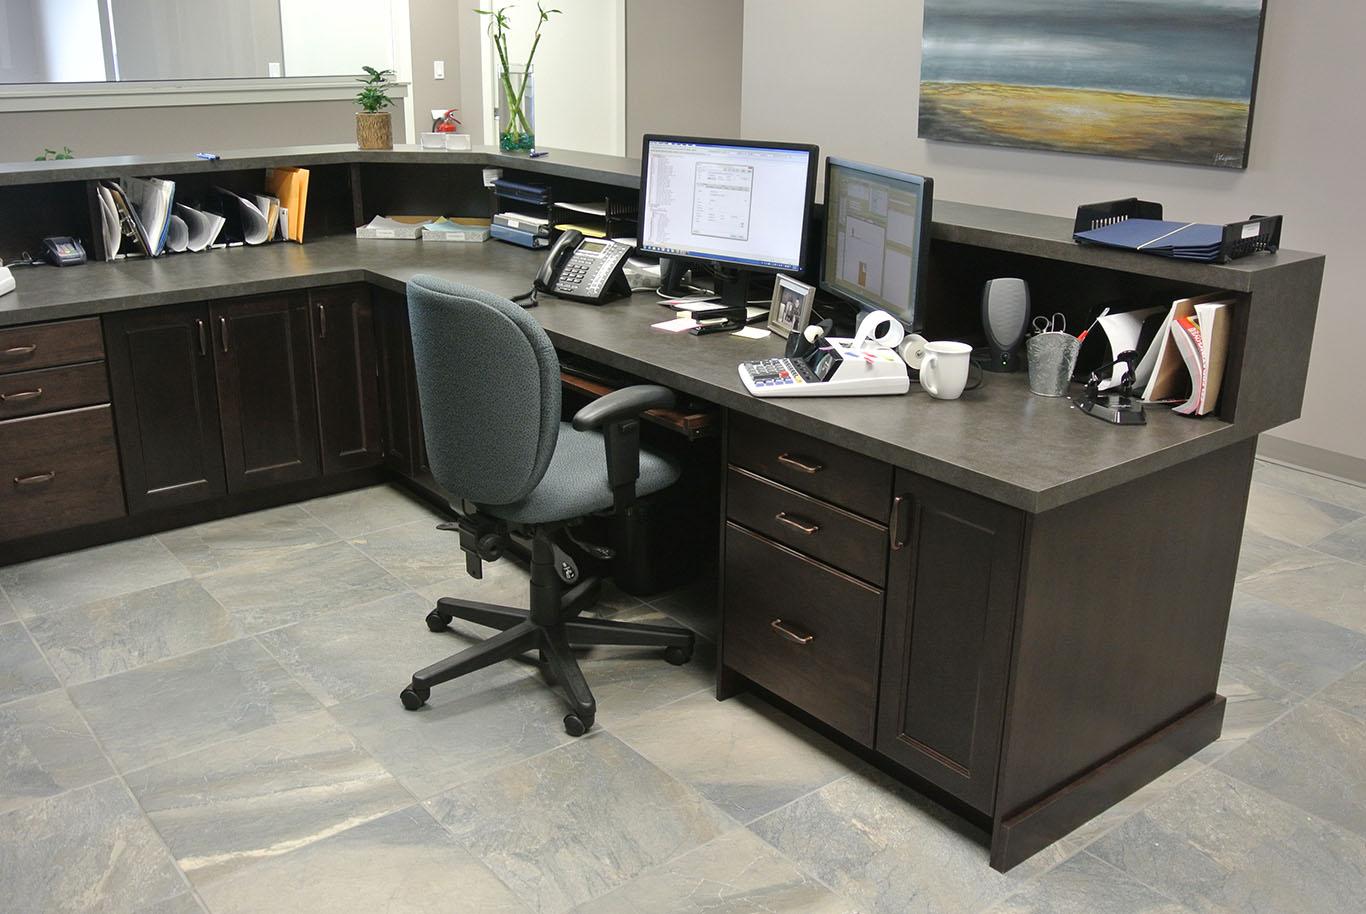 Taylor_Adams_Office_cabinetry_010.jpg